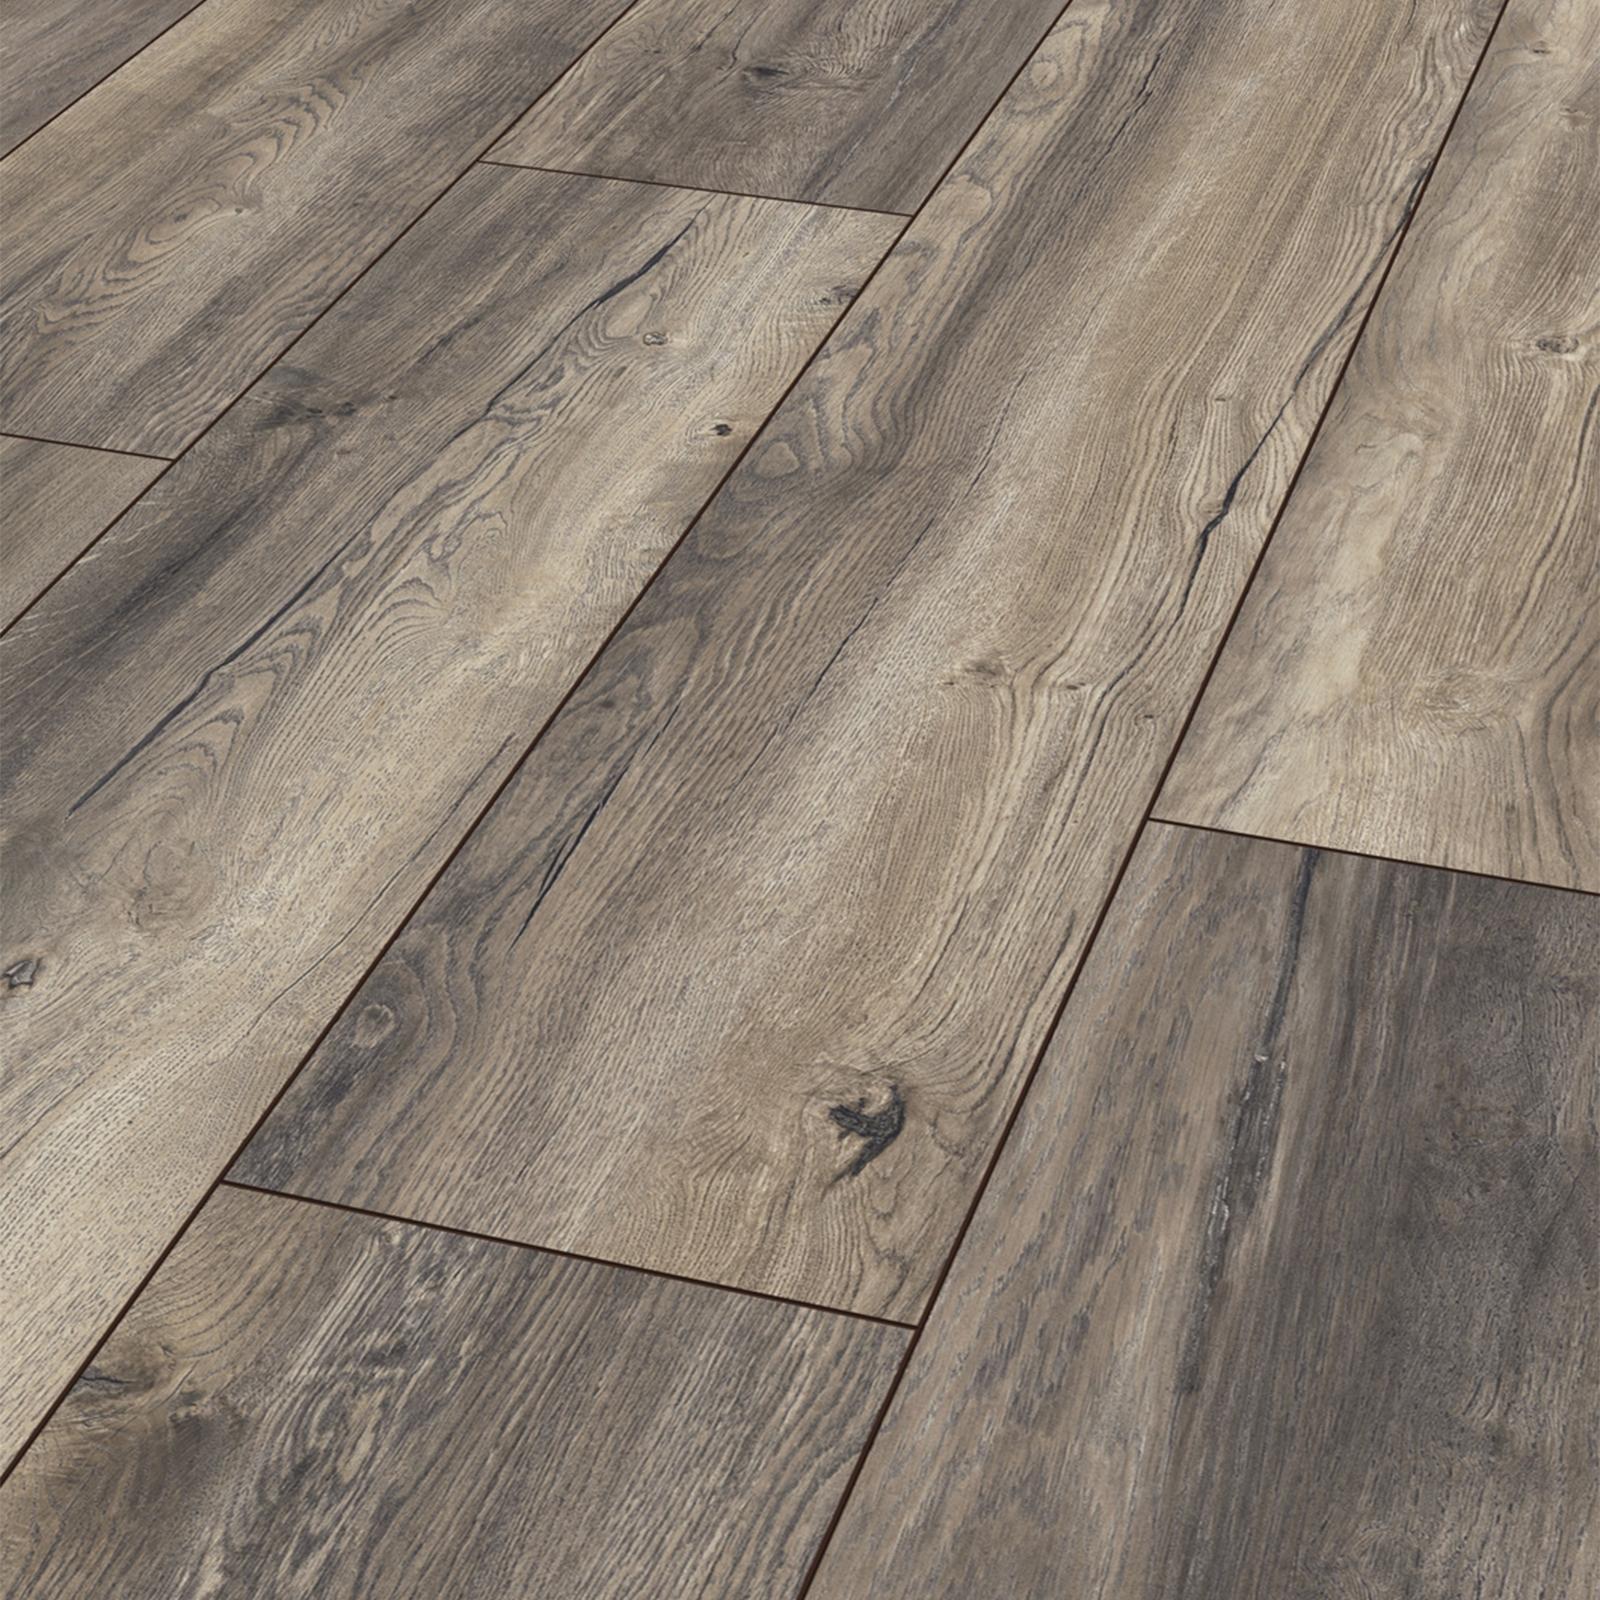 kronotex laminat boden exquisit plus harbour oak grau optional d mmung leisten ebay. Black Bedroom Furniture Sets. Home Design Ideas